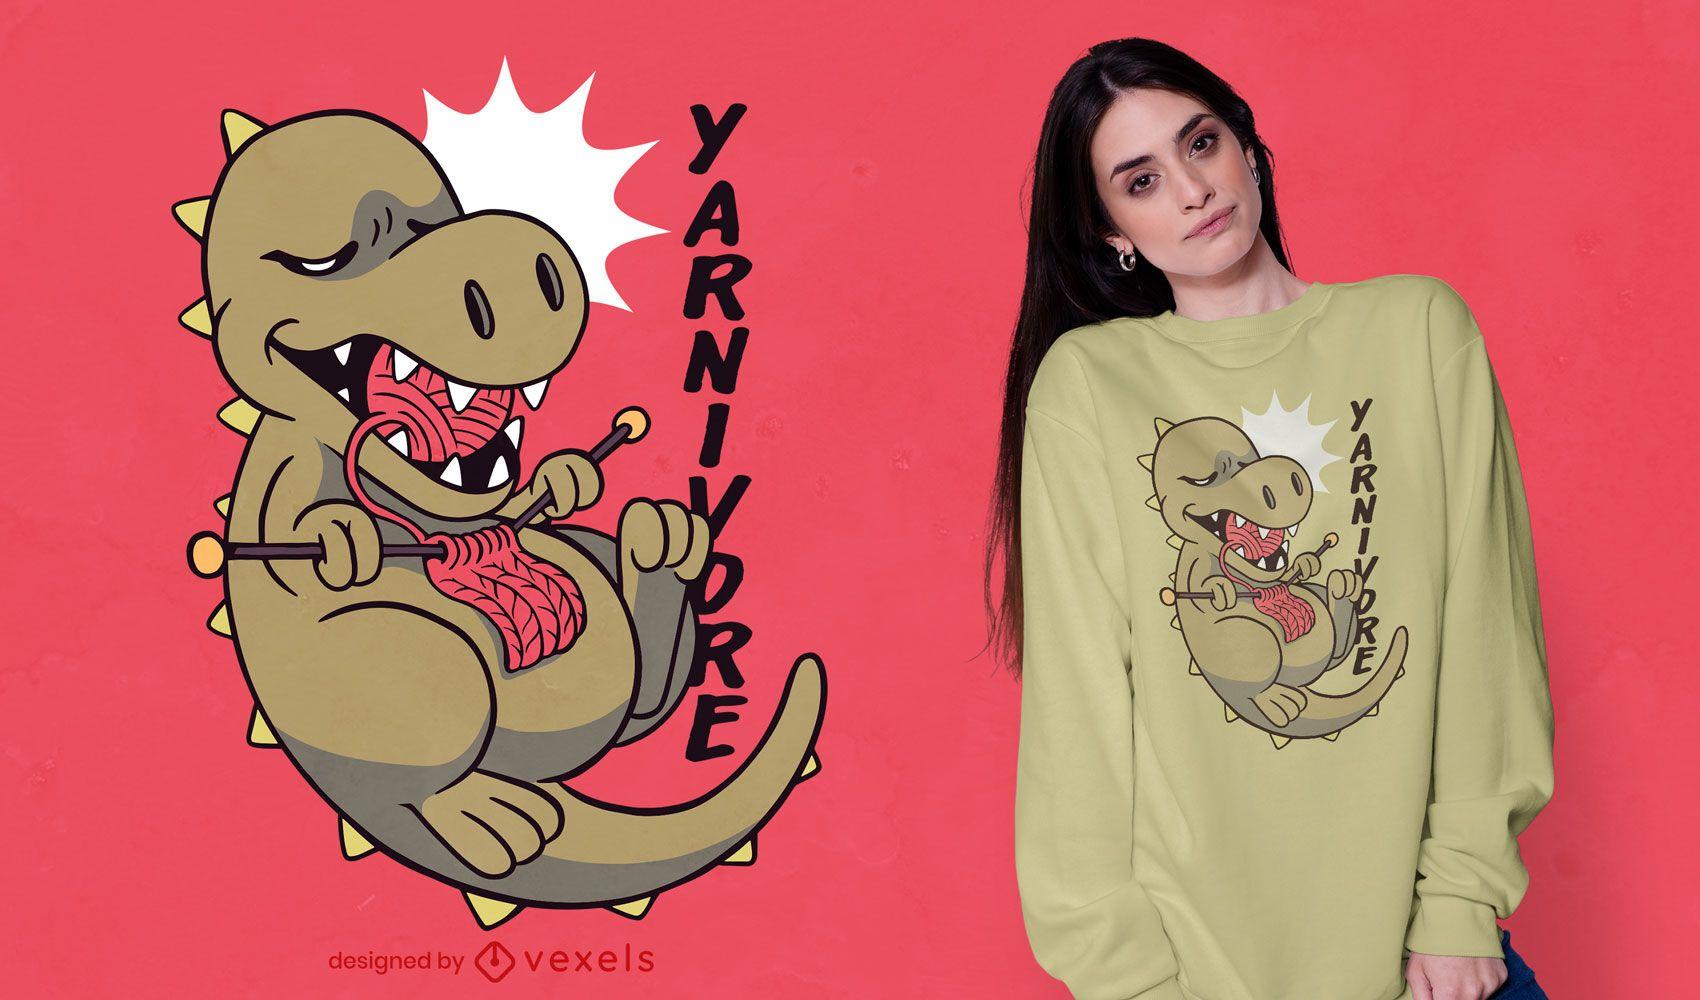 Yarnivore t-shirt design